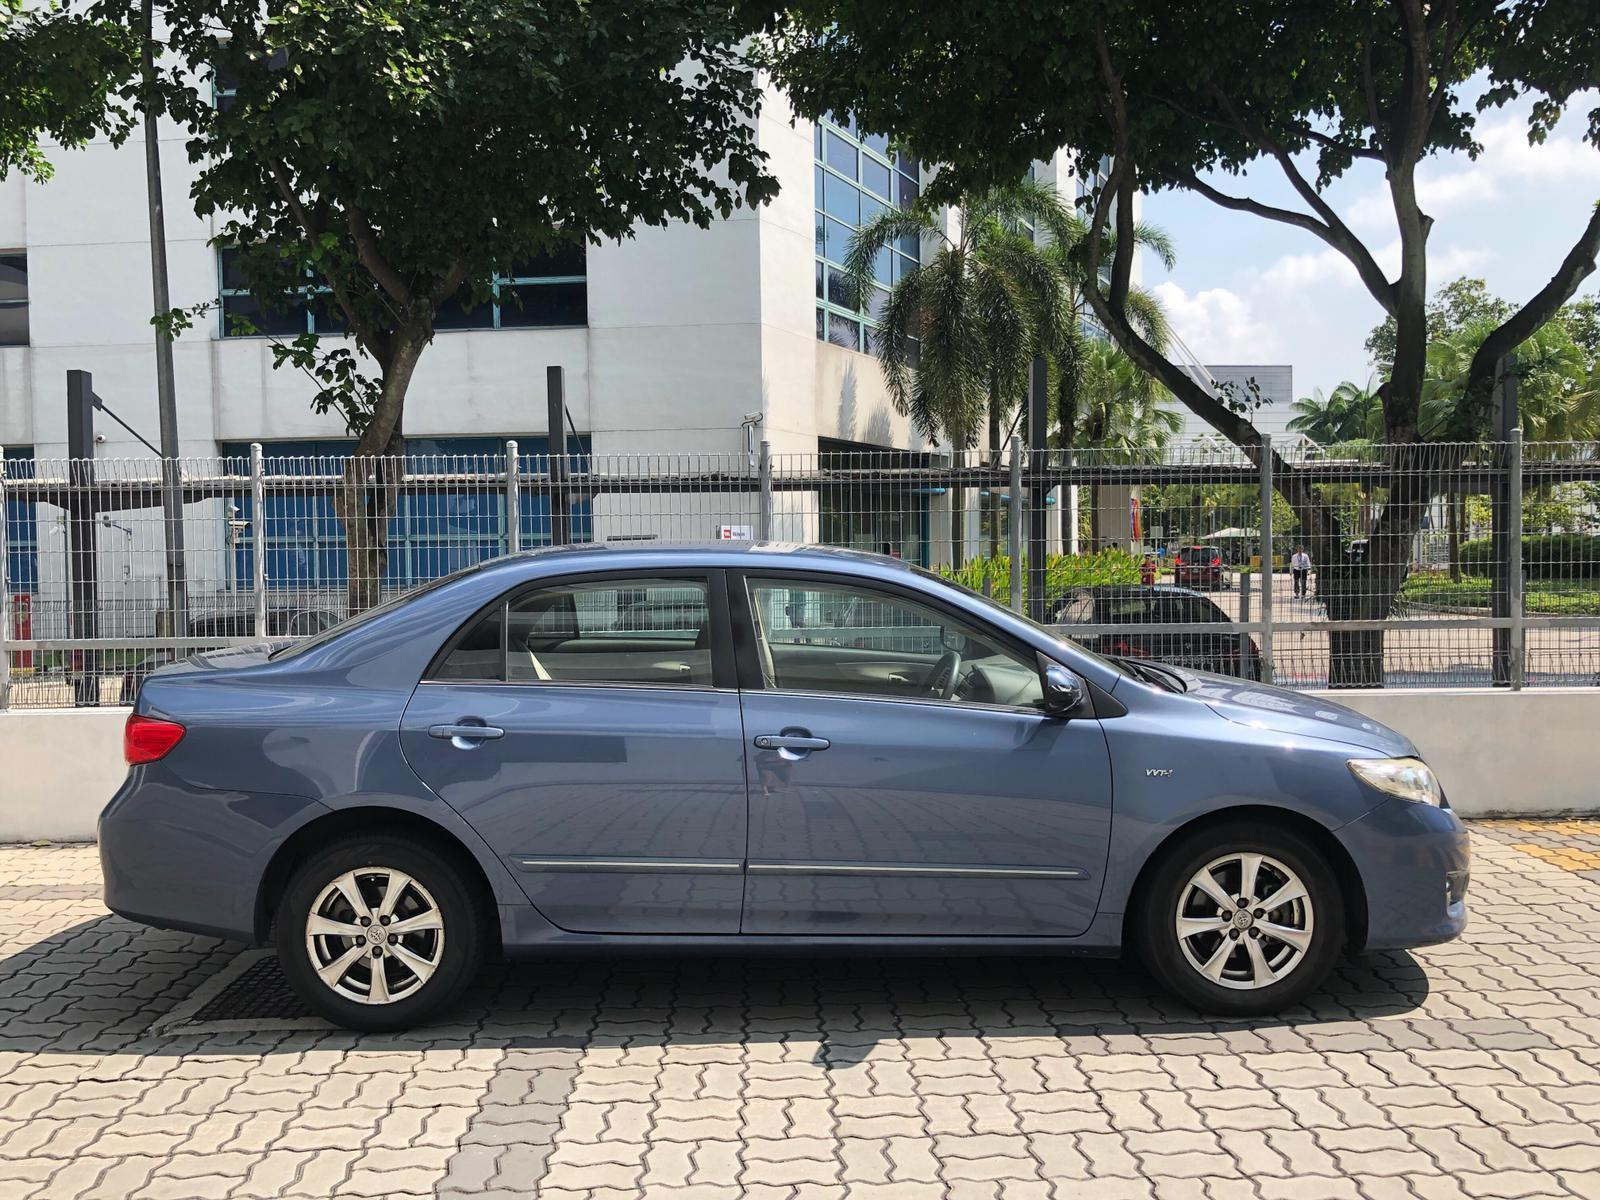 Toyota Altis 1.6a  Car Axio Premio Allion Camry Honda Jazz Fit Civic Cars Hyundai Avante Grab Rental Gojek Or Personal Use Low price and Cheap